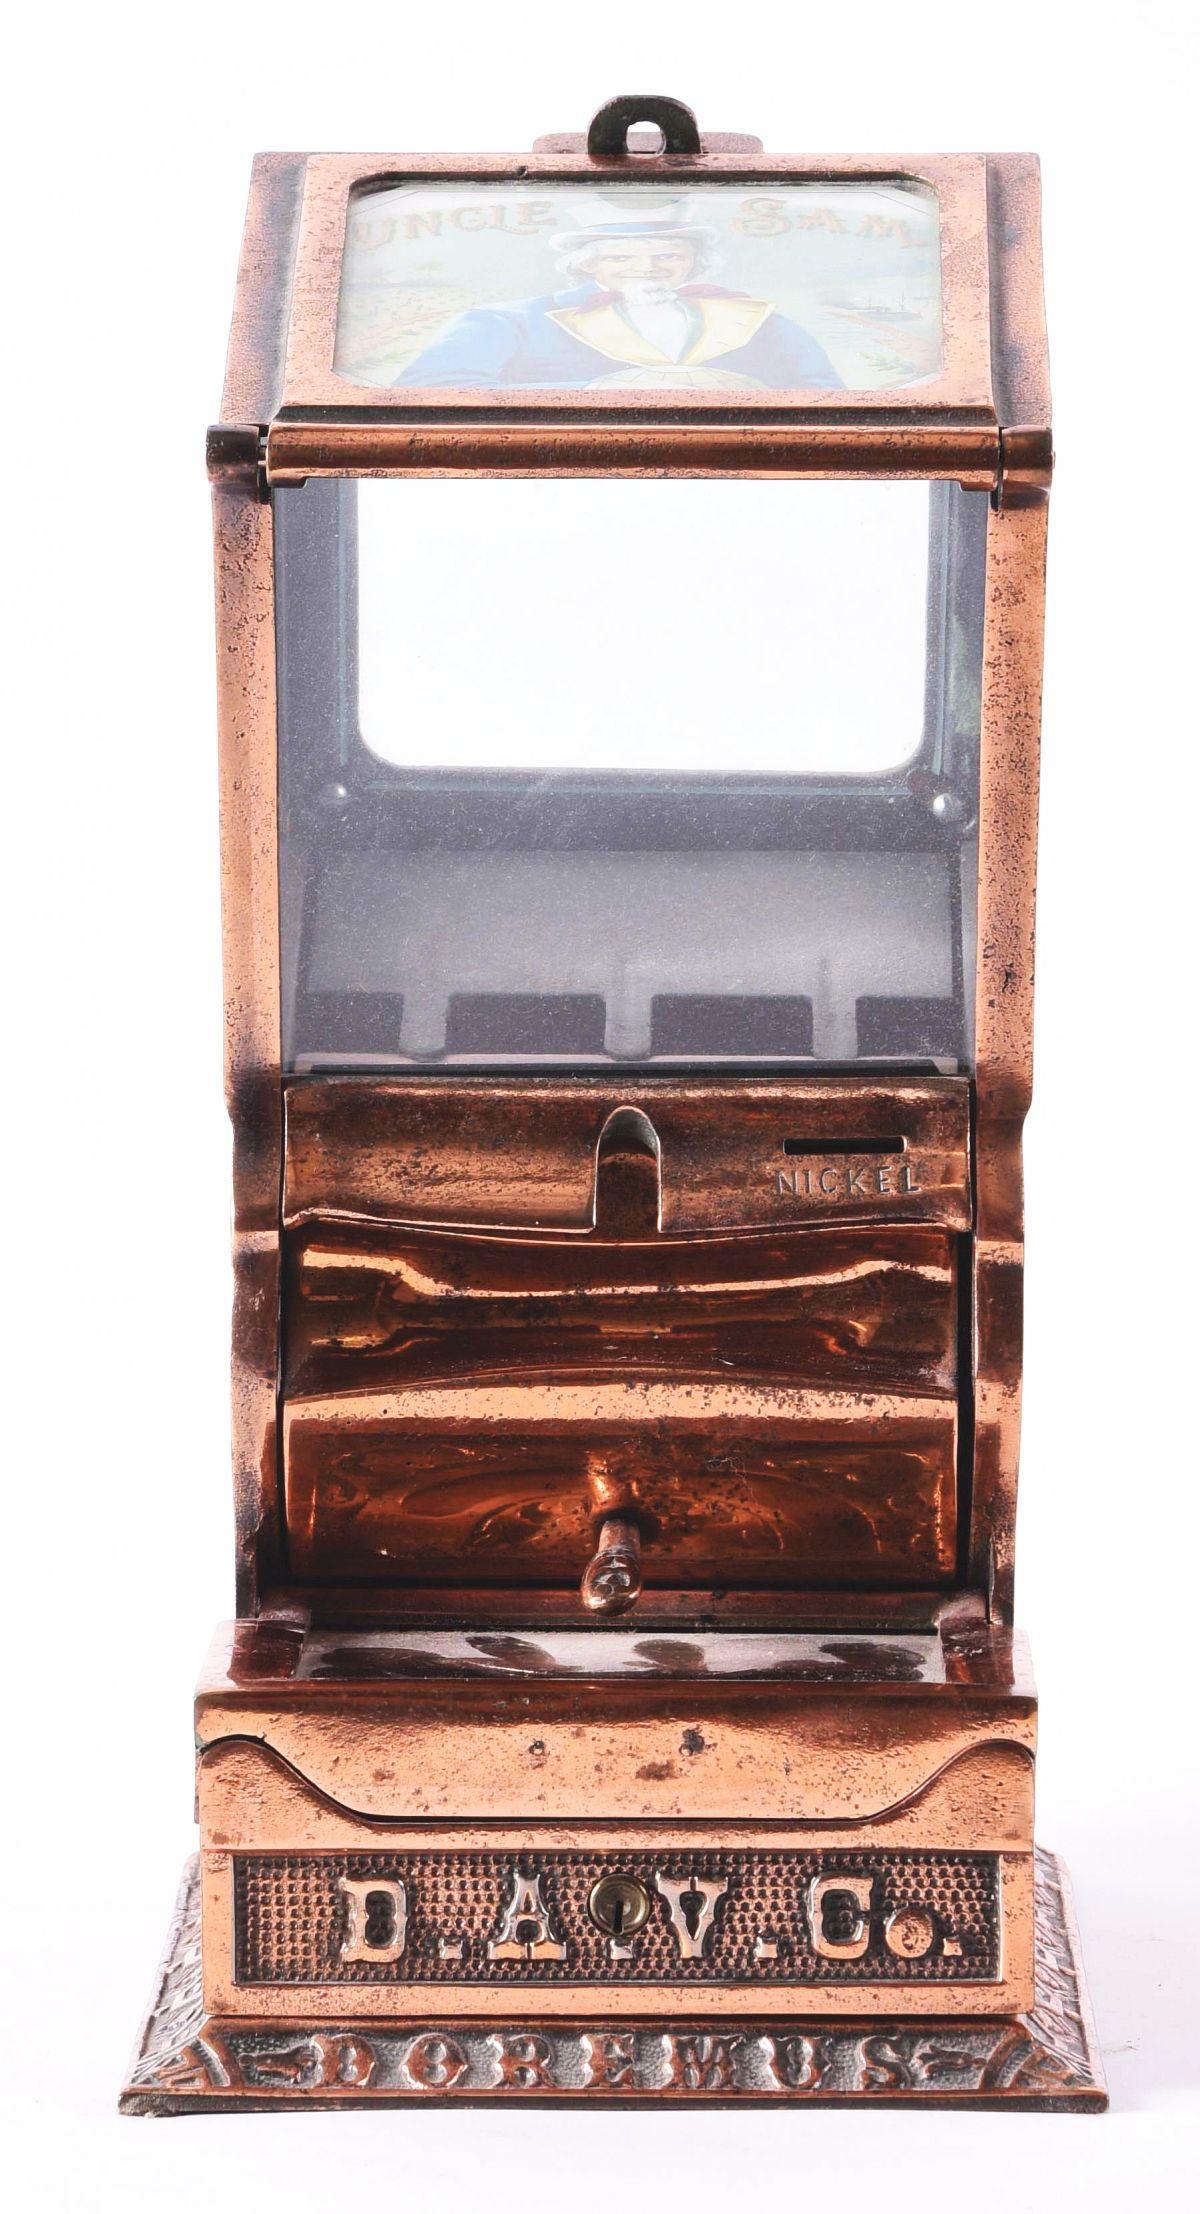 5¢ DOREMUS CAST IRON CIGAR VENDER.